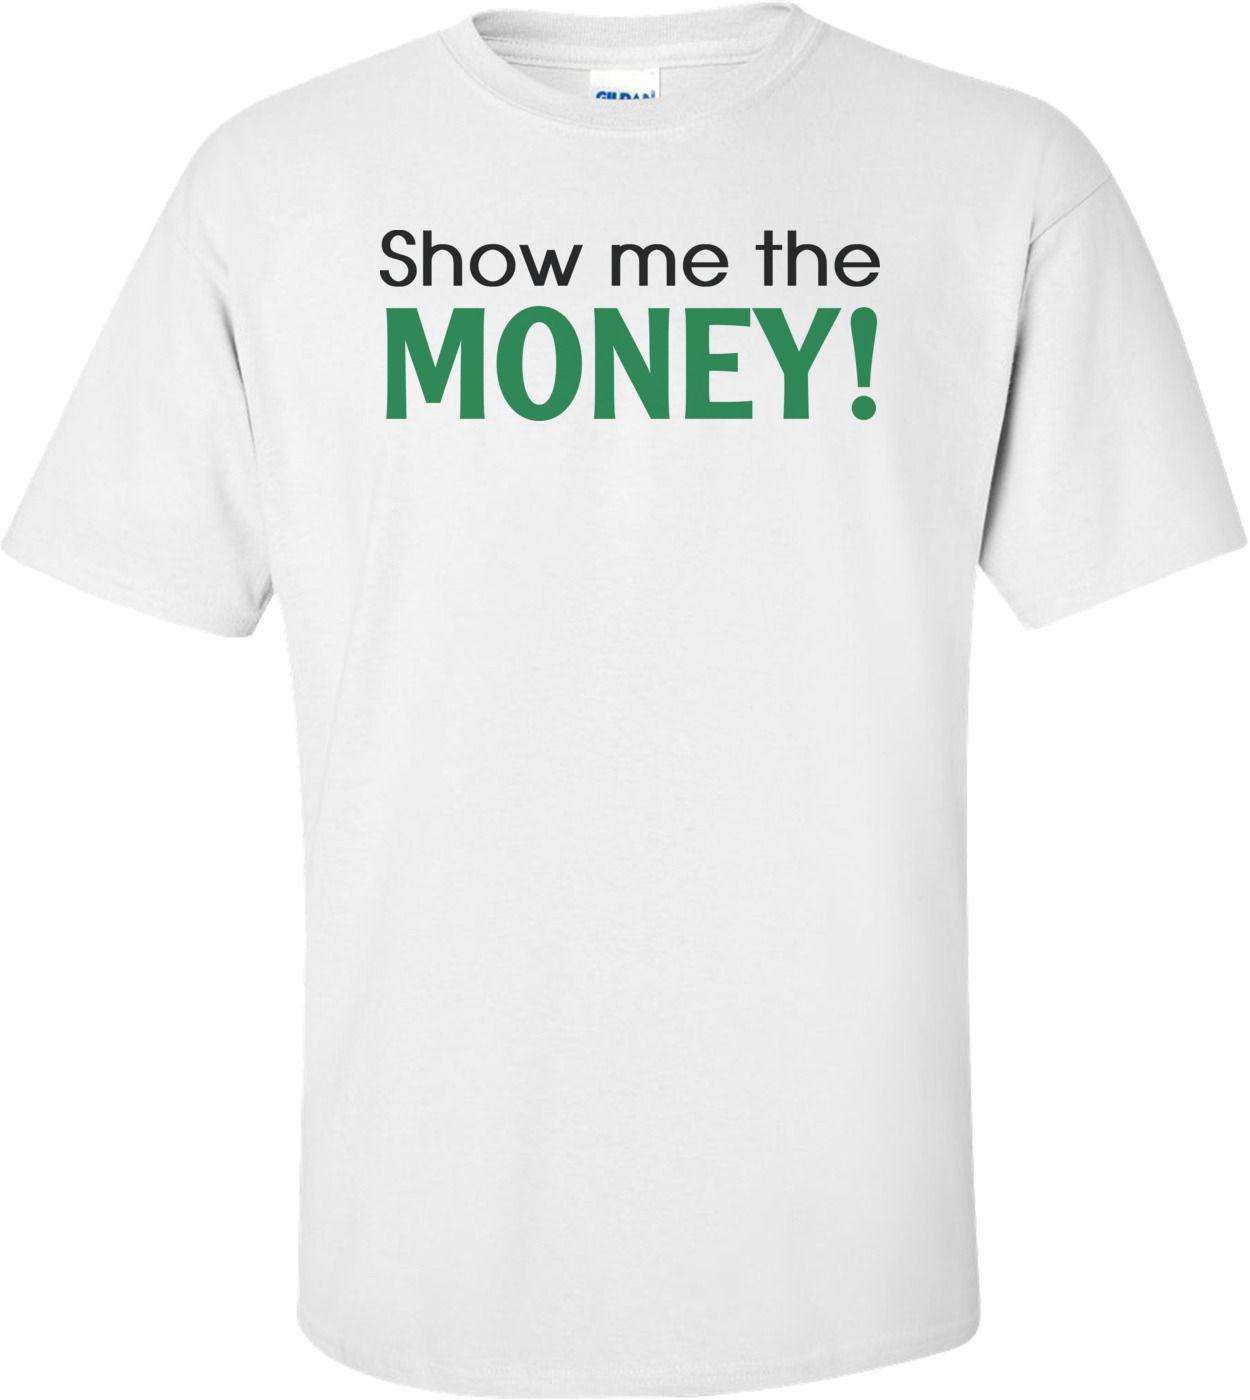 Show Me The Money T Shirt 3d Men Hot Cheap Short Sleeve Male T Shirt 100%  Cotton Short Sleeves Tee Shirts Top Tee Graphic Tee Shirts T Shirt Sayings  From ... c6228180922c